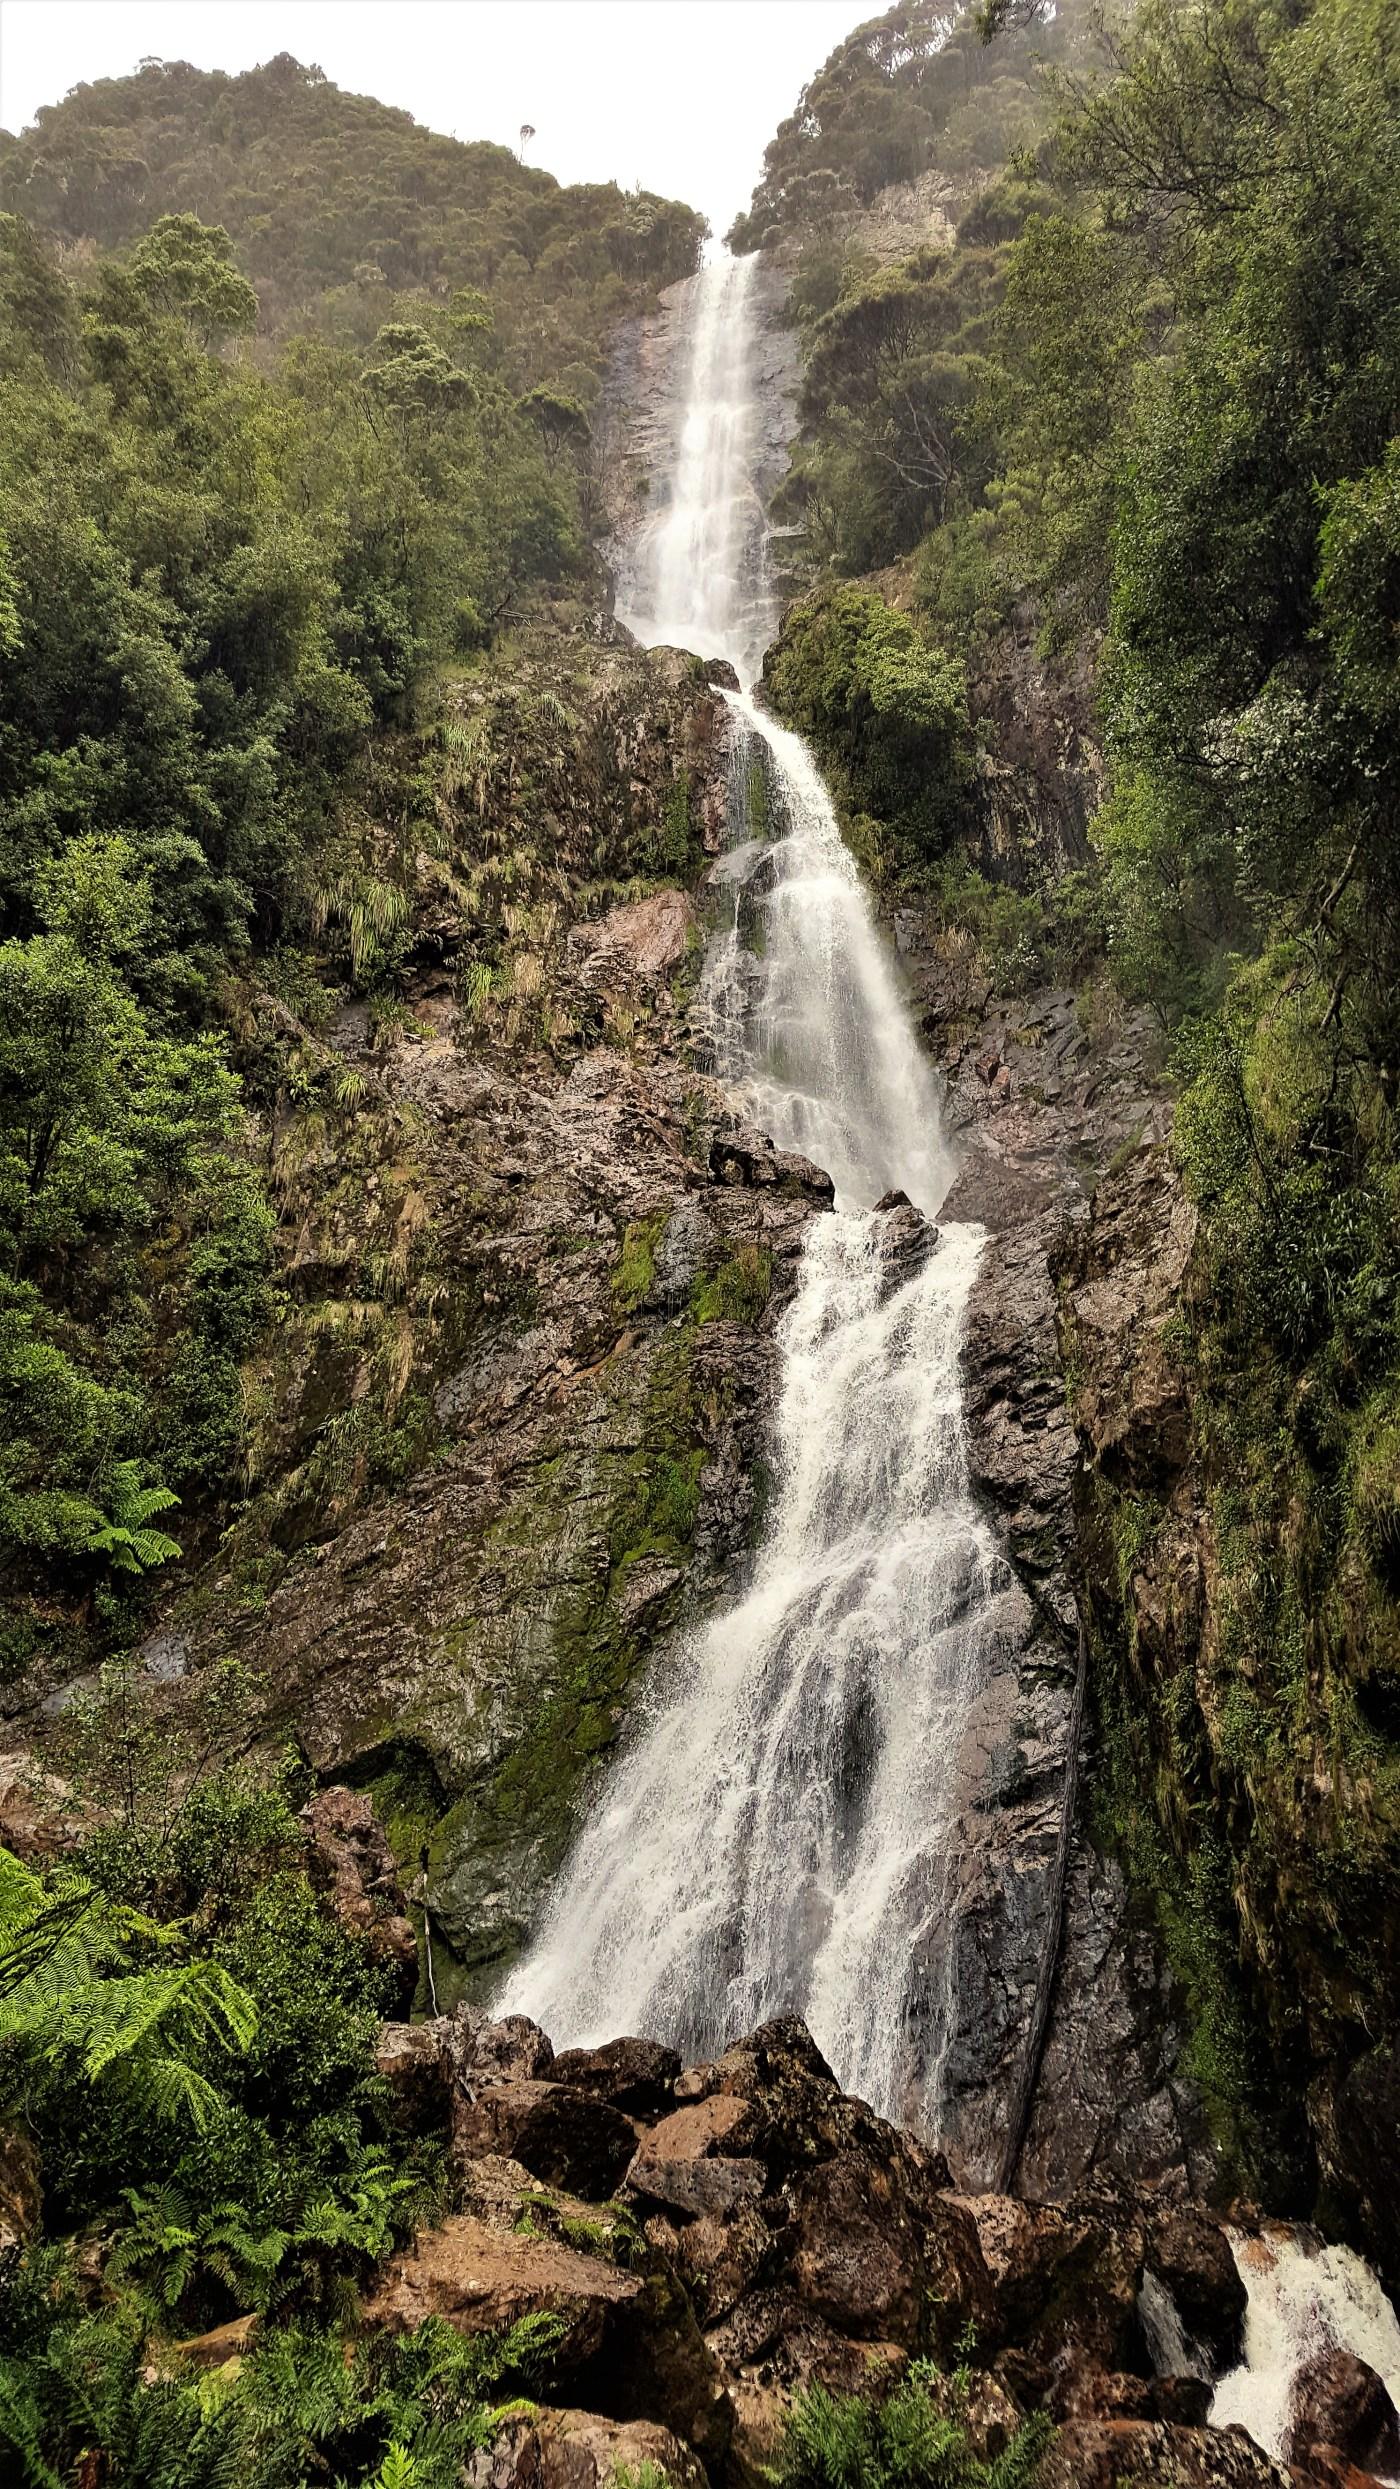 montezuma falls - Pieman River To Trial Harbour